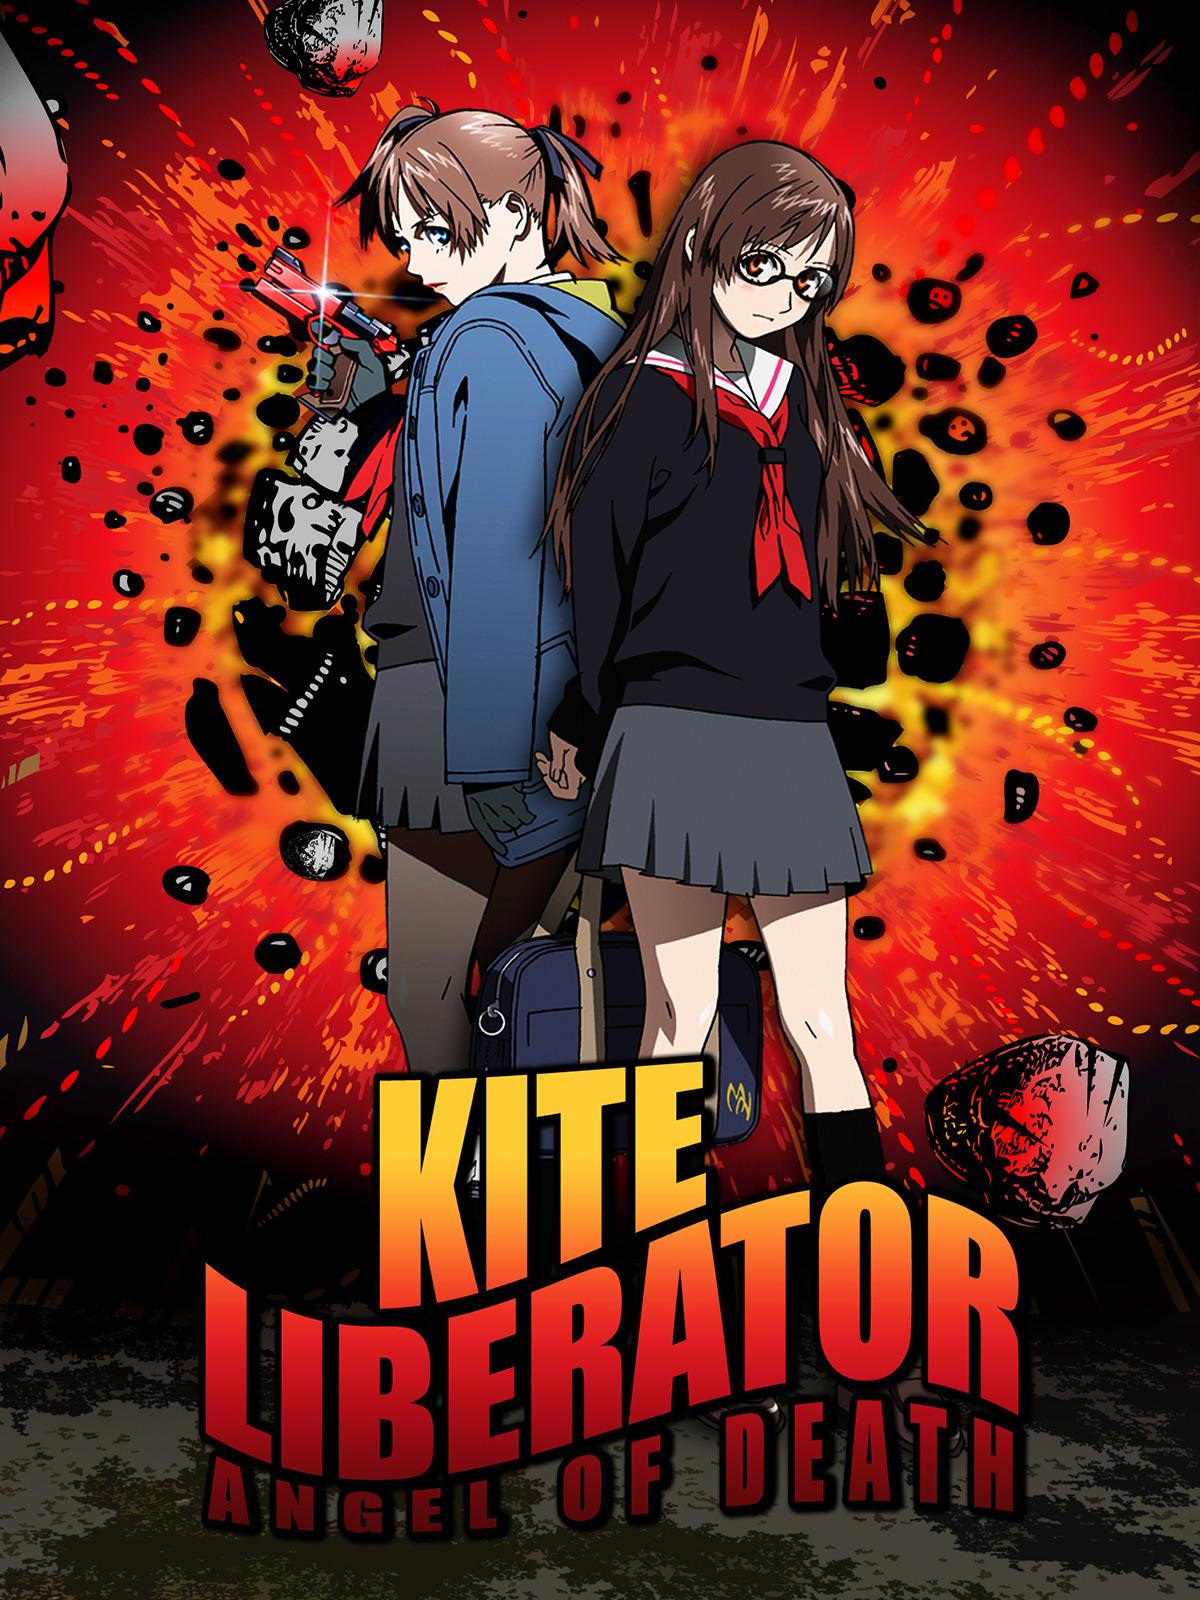 Kite Liberator